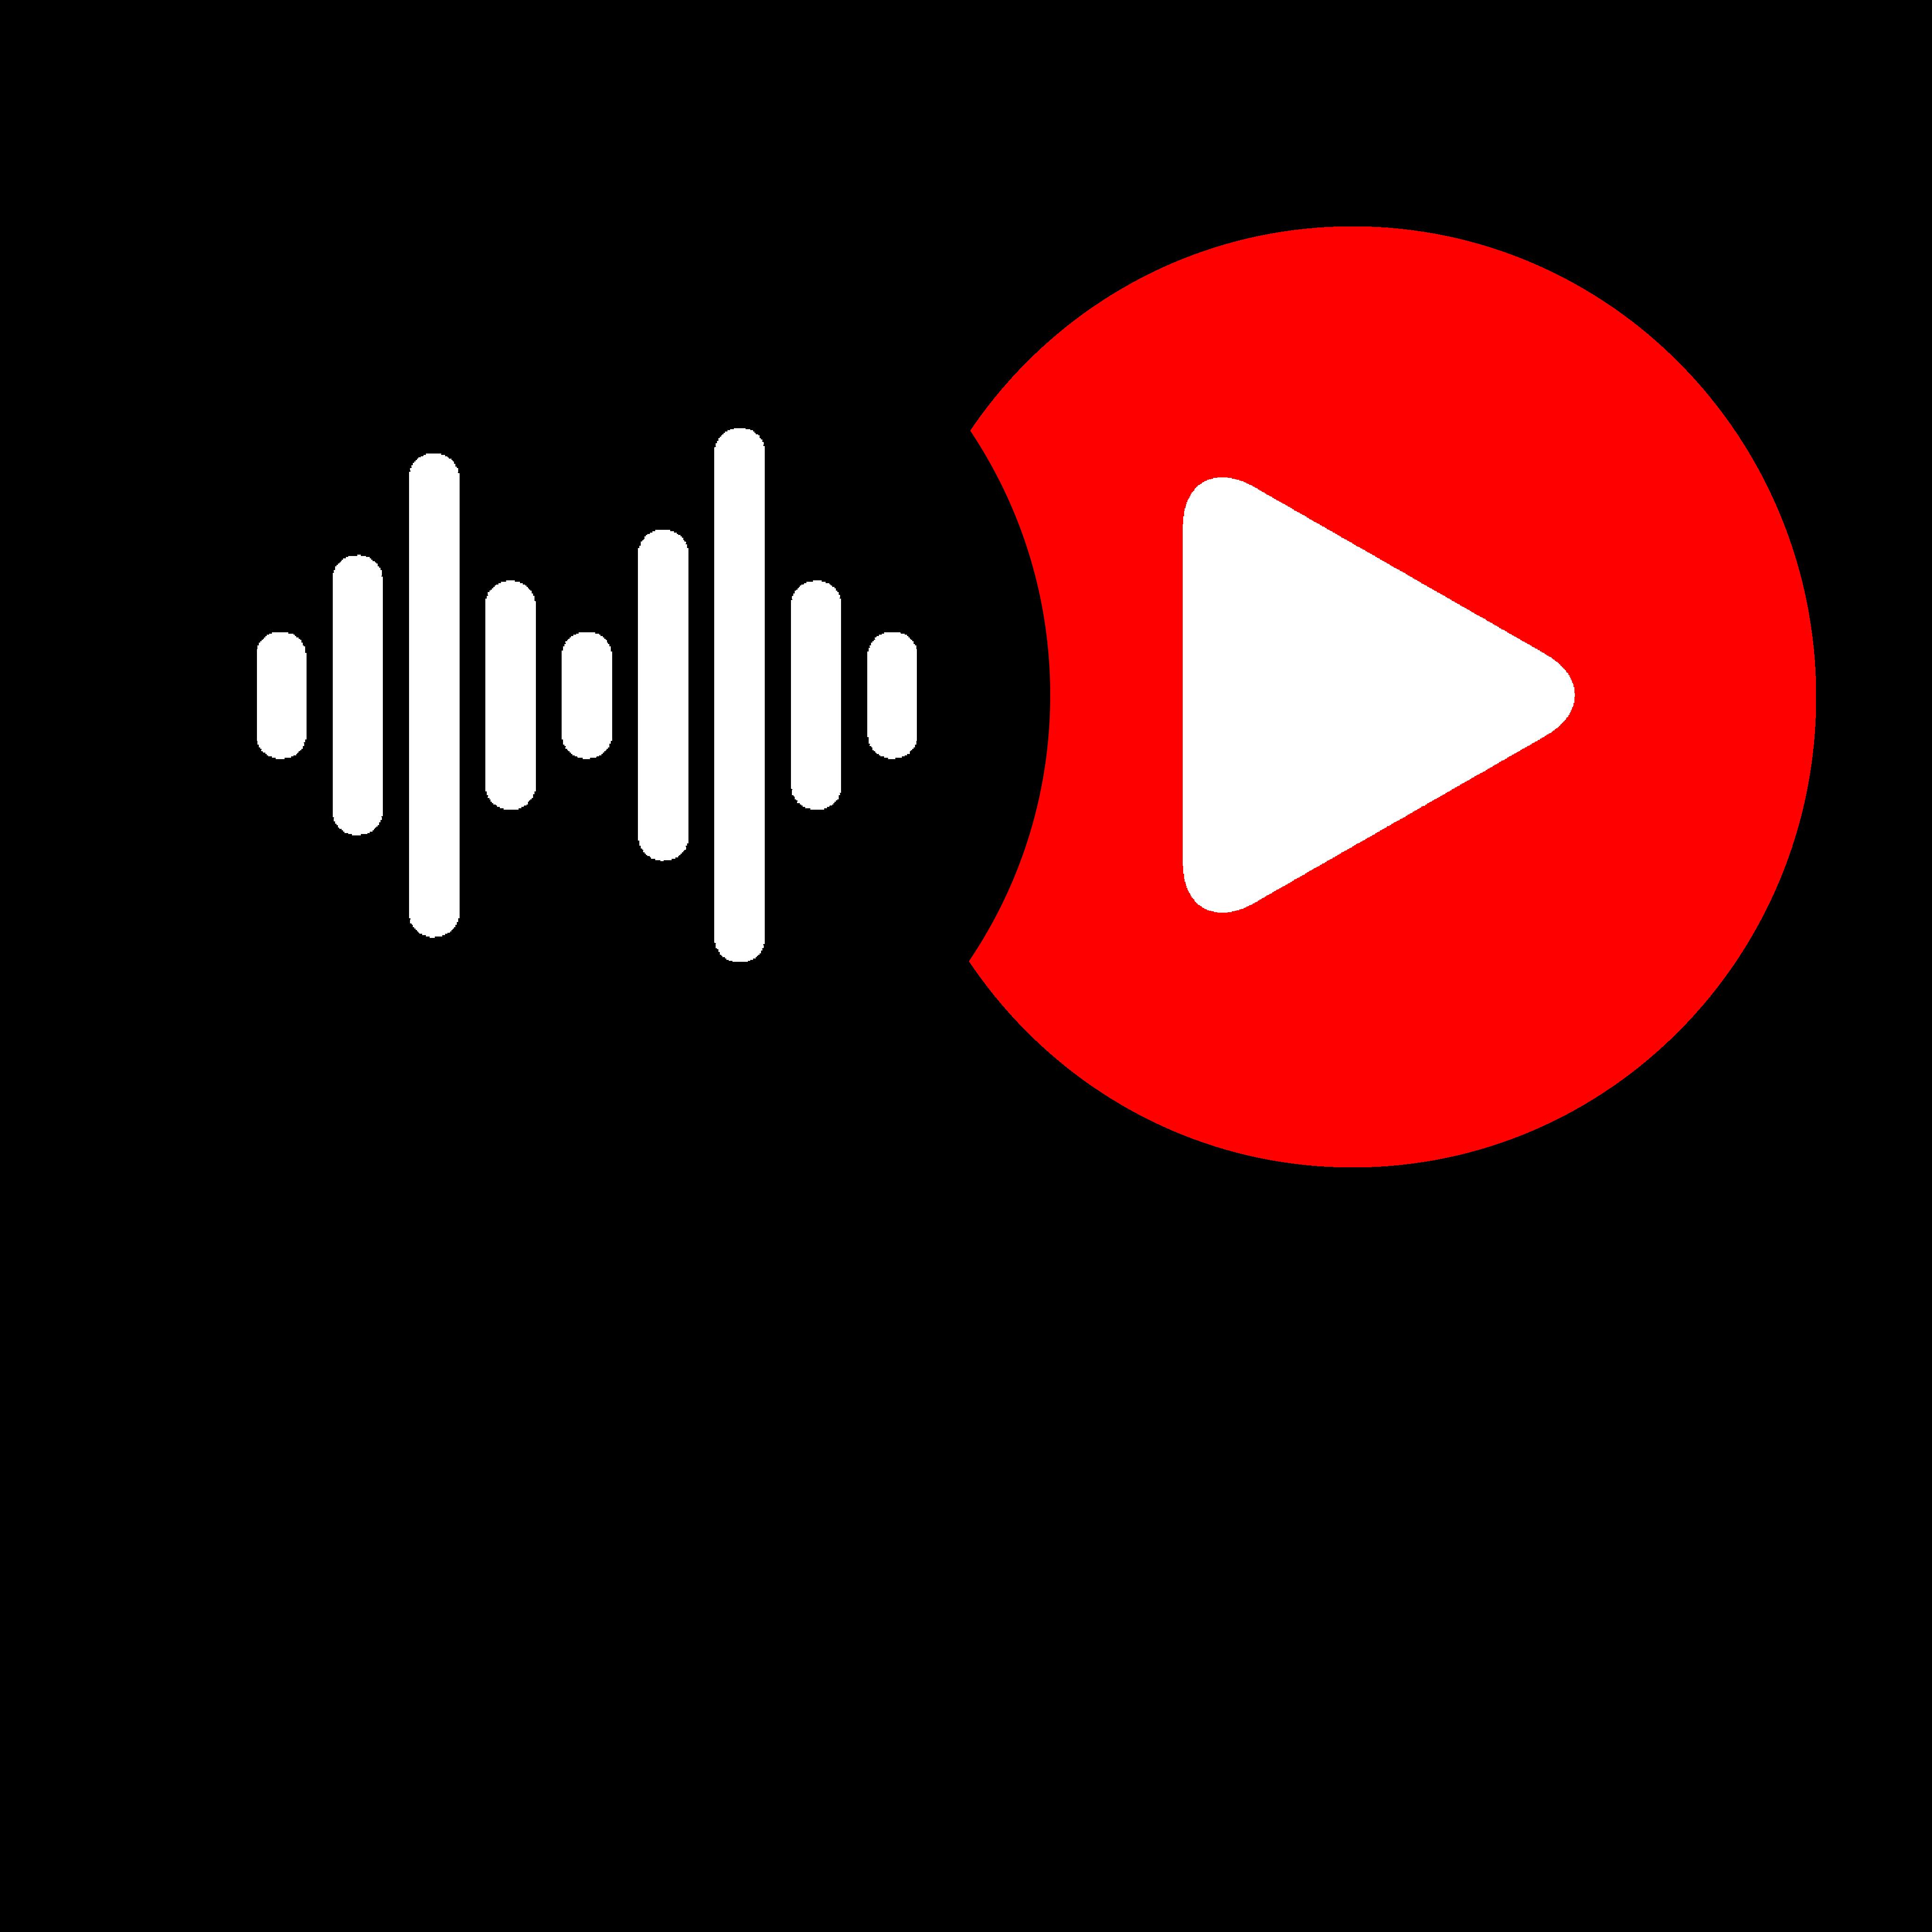 Custom Sound and Video